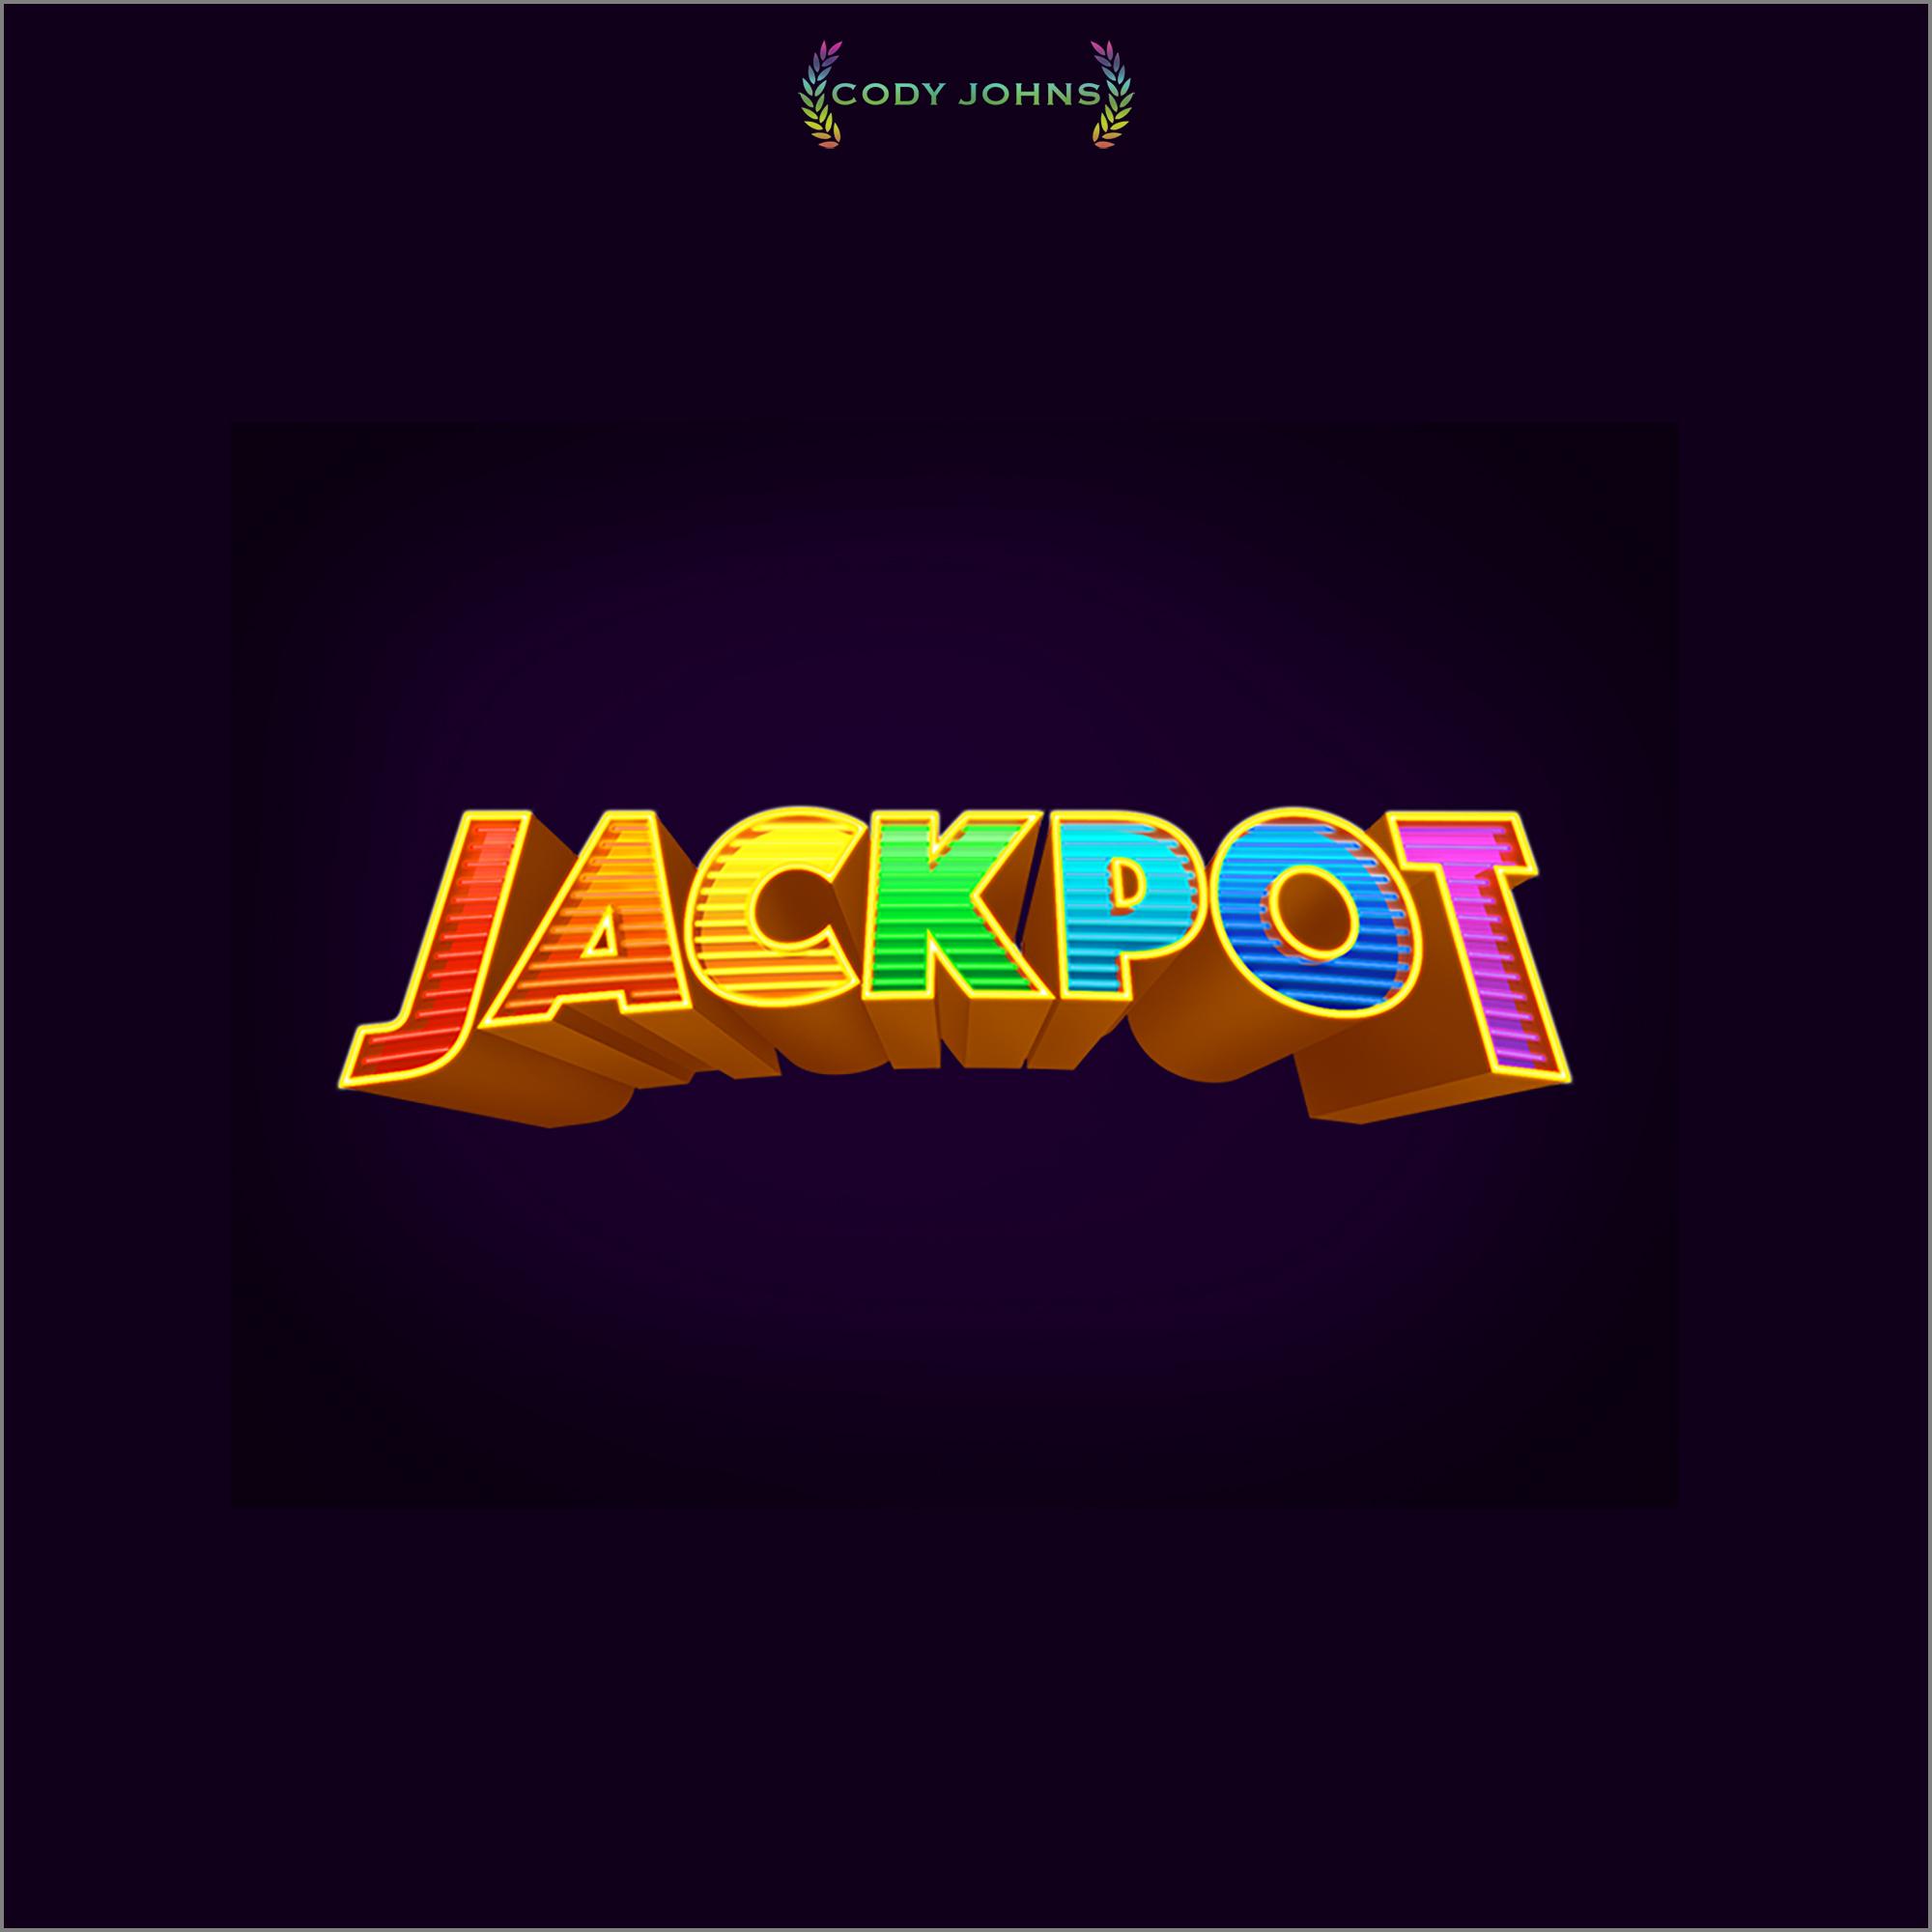 CodyJohns-Jackpot-FRONT.jpg